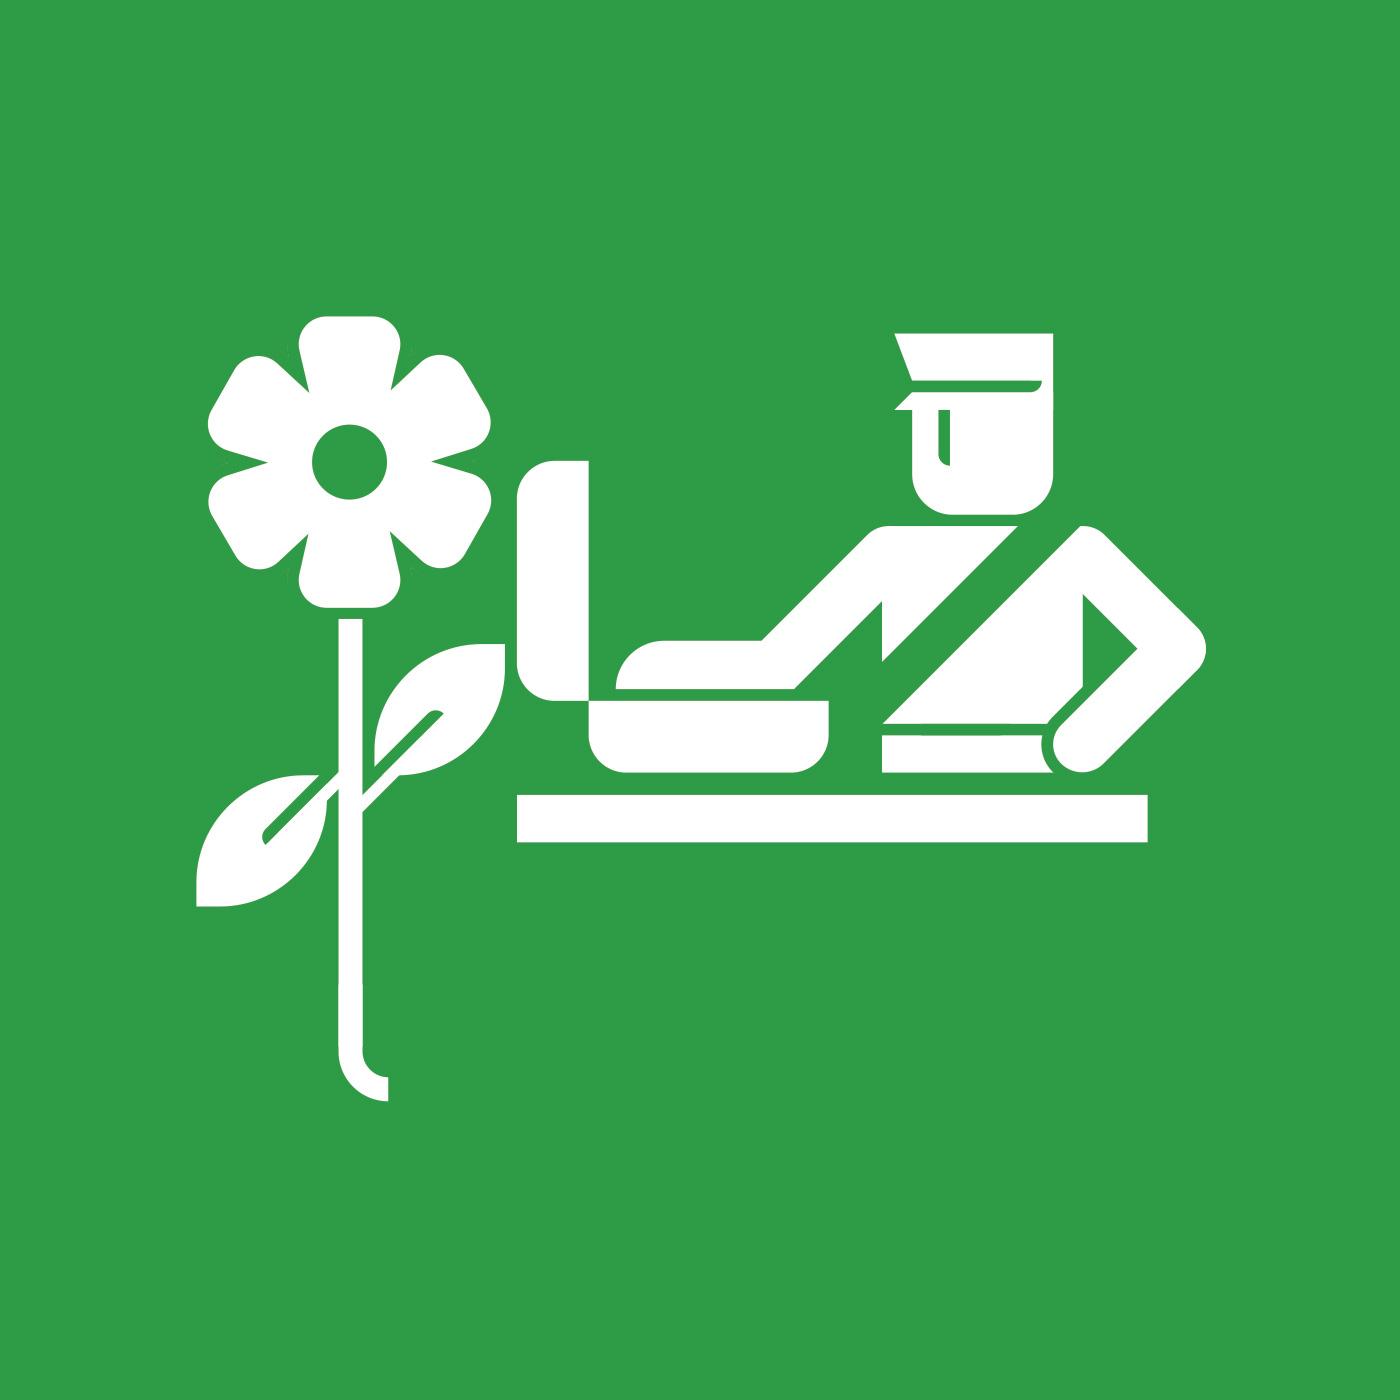 pictograms_andre_levy_zhion_vector_campaign_palmengarten_frankfurt_christian_schoen_neophyten_minimal_icon_1.jpg